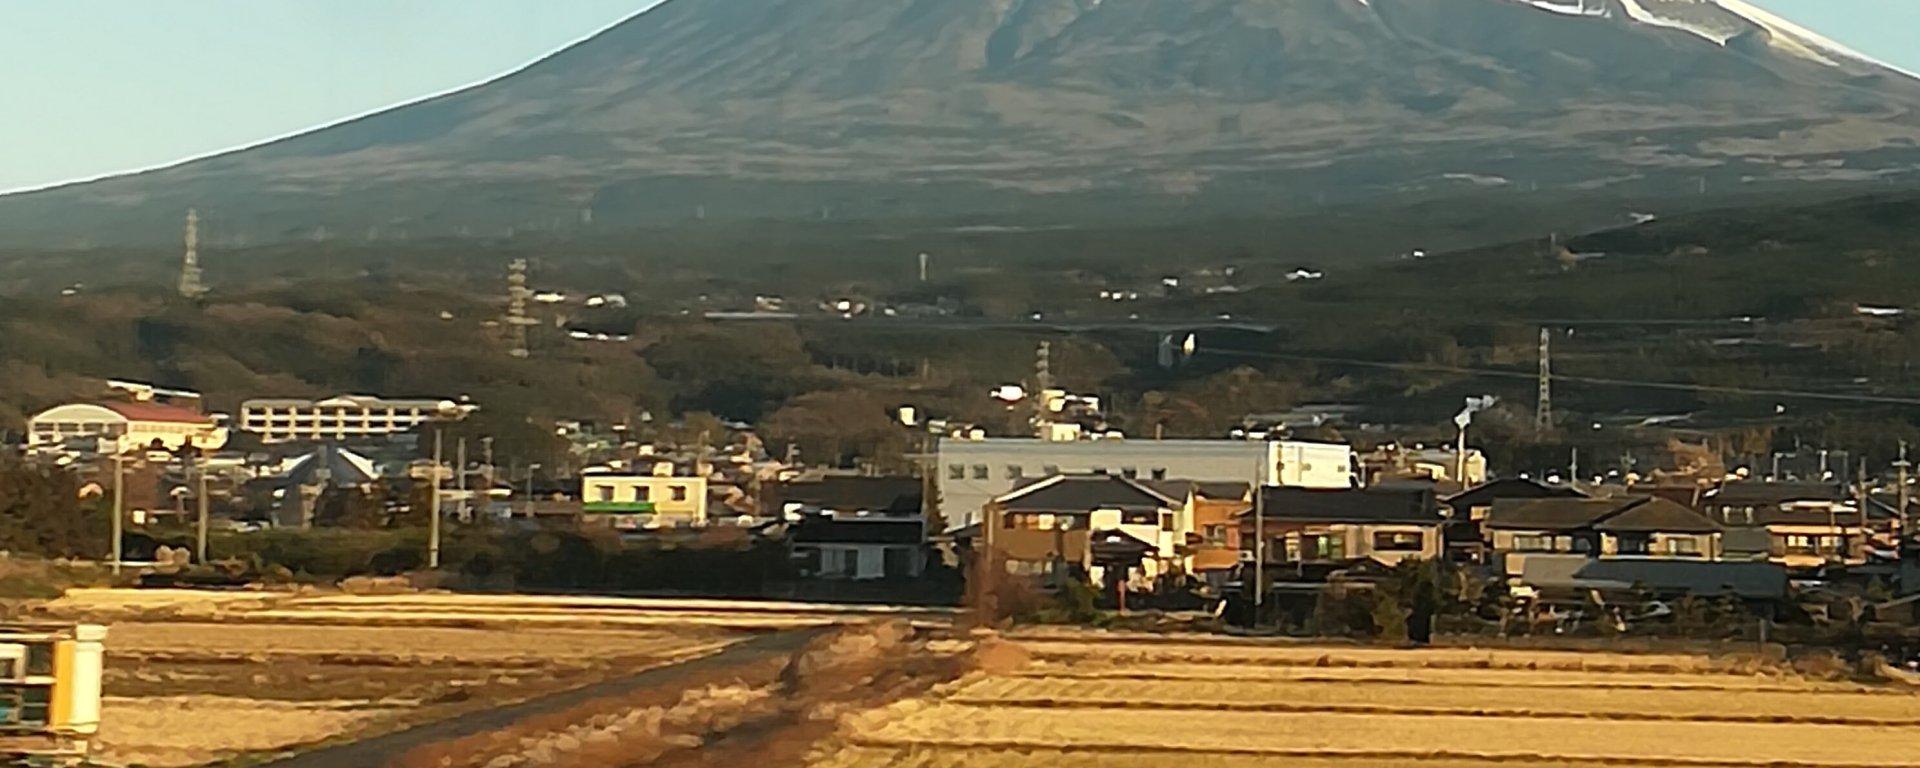 Mt. Fuji view from Shinkansen bullet train after Odawara Kanagawa Japan